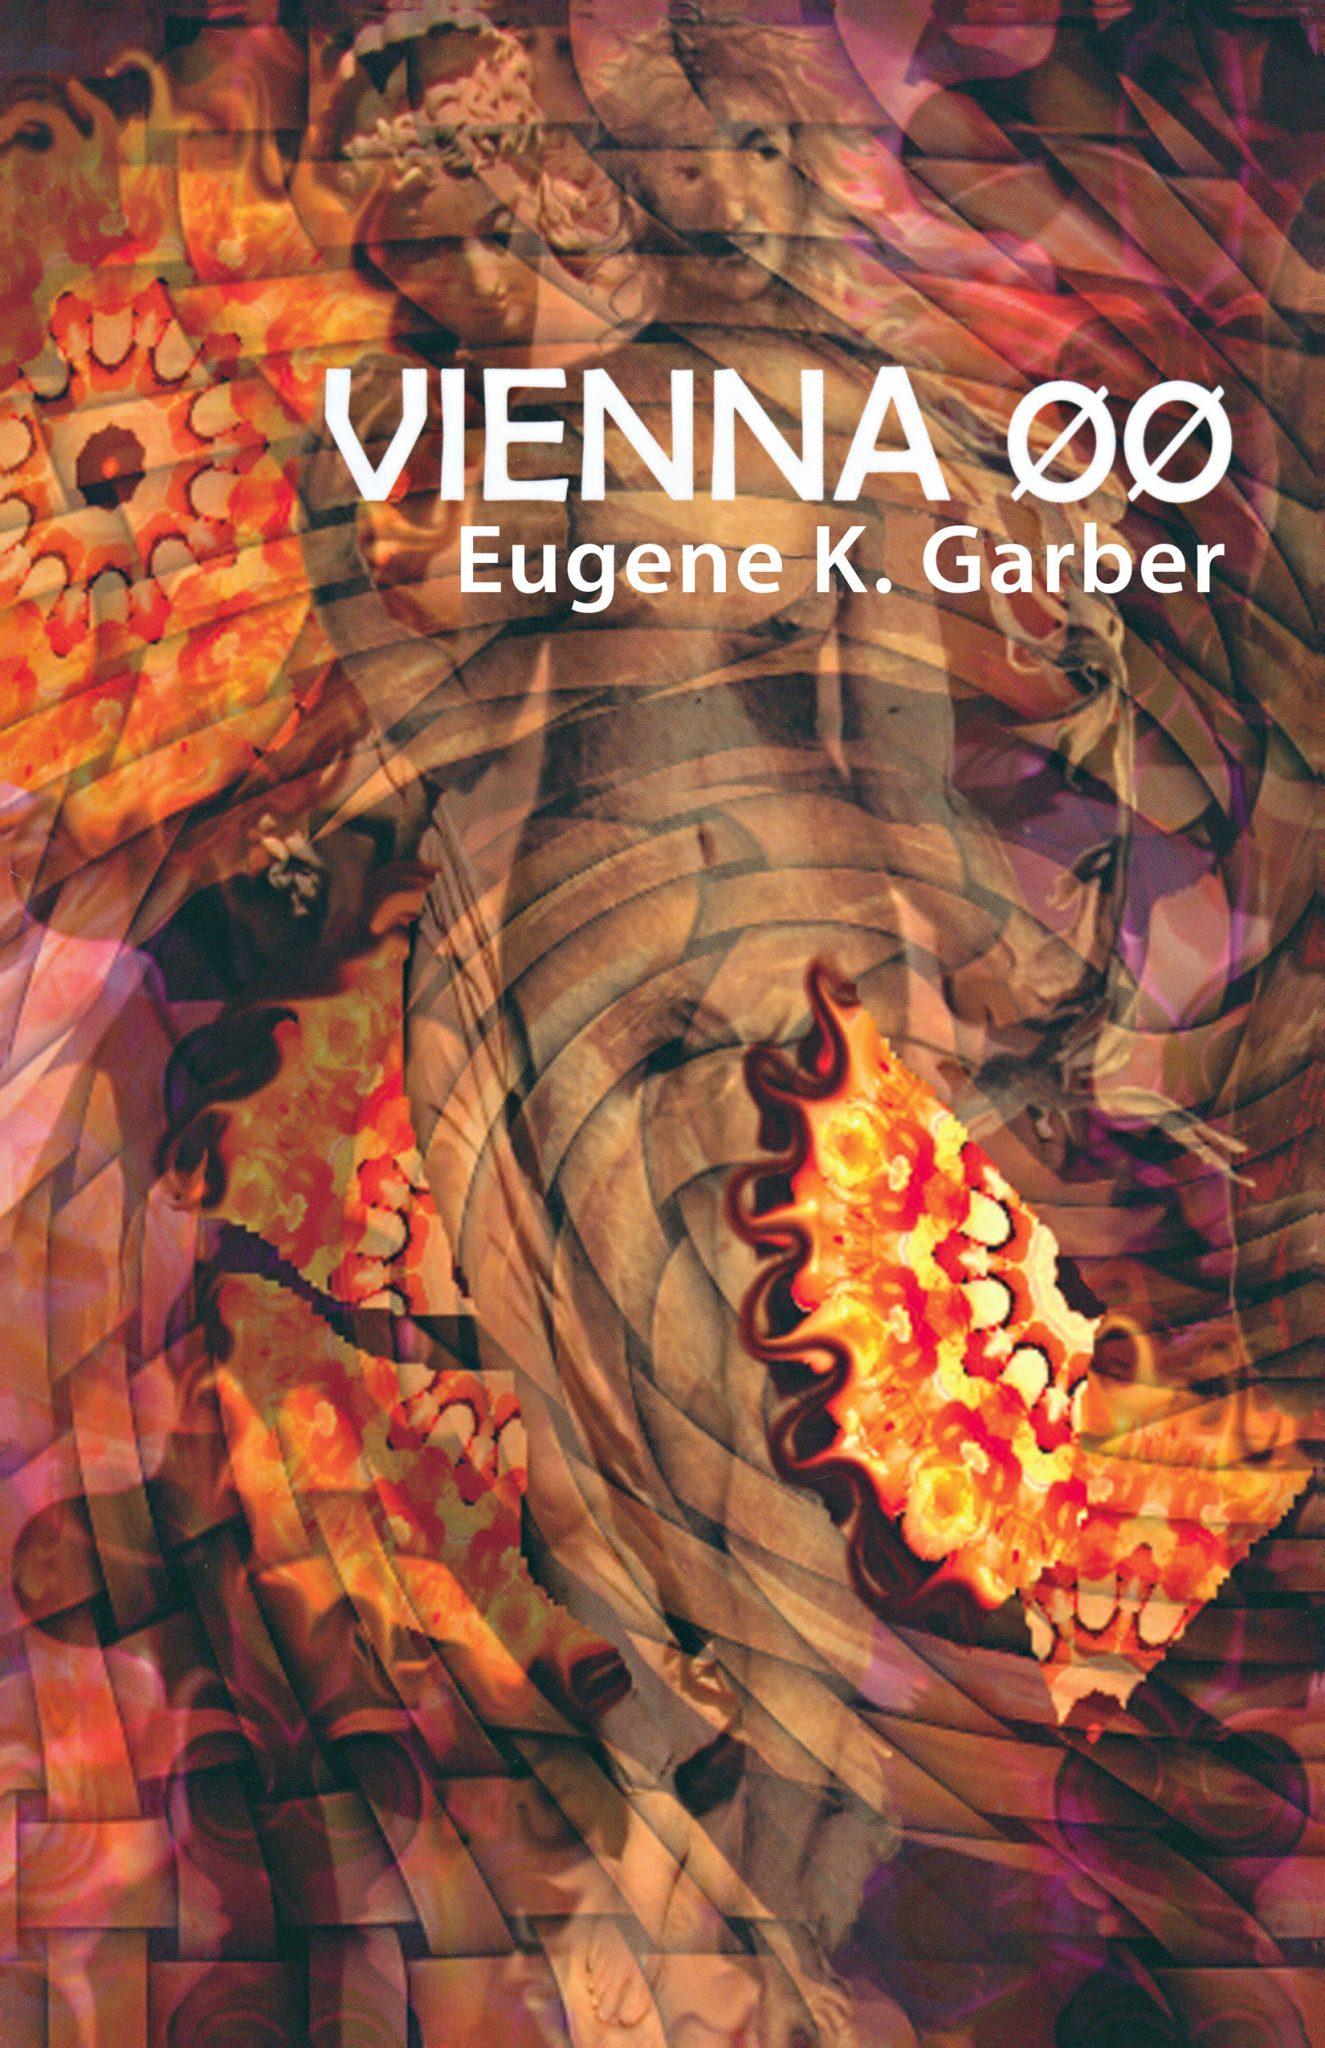 Vienna ØØ, Book 1 of The Eroica Trilogy